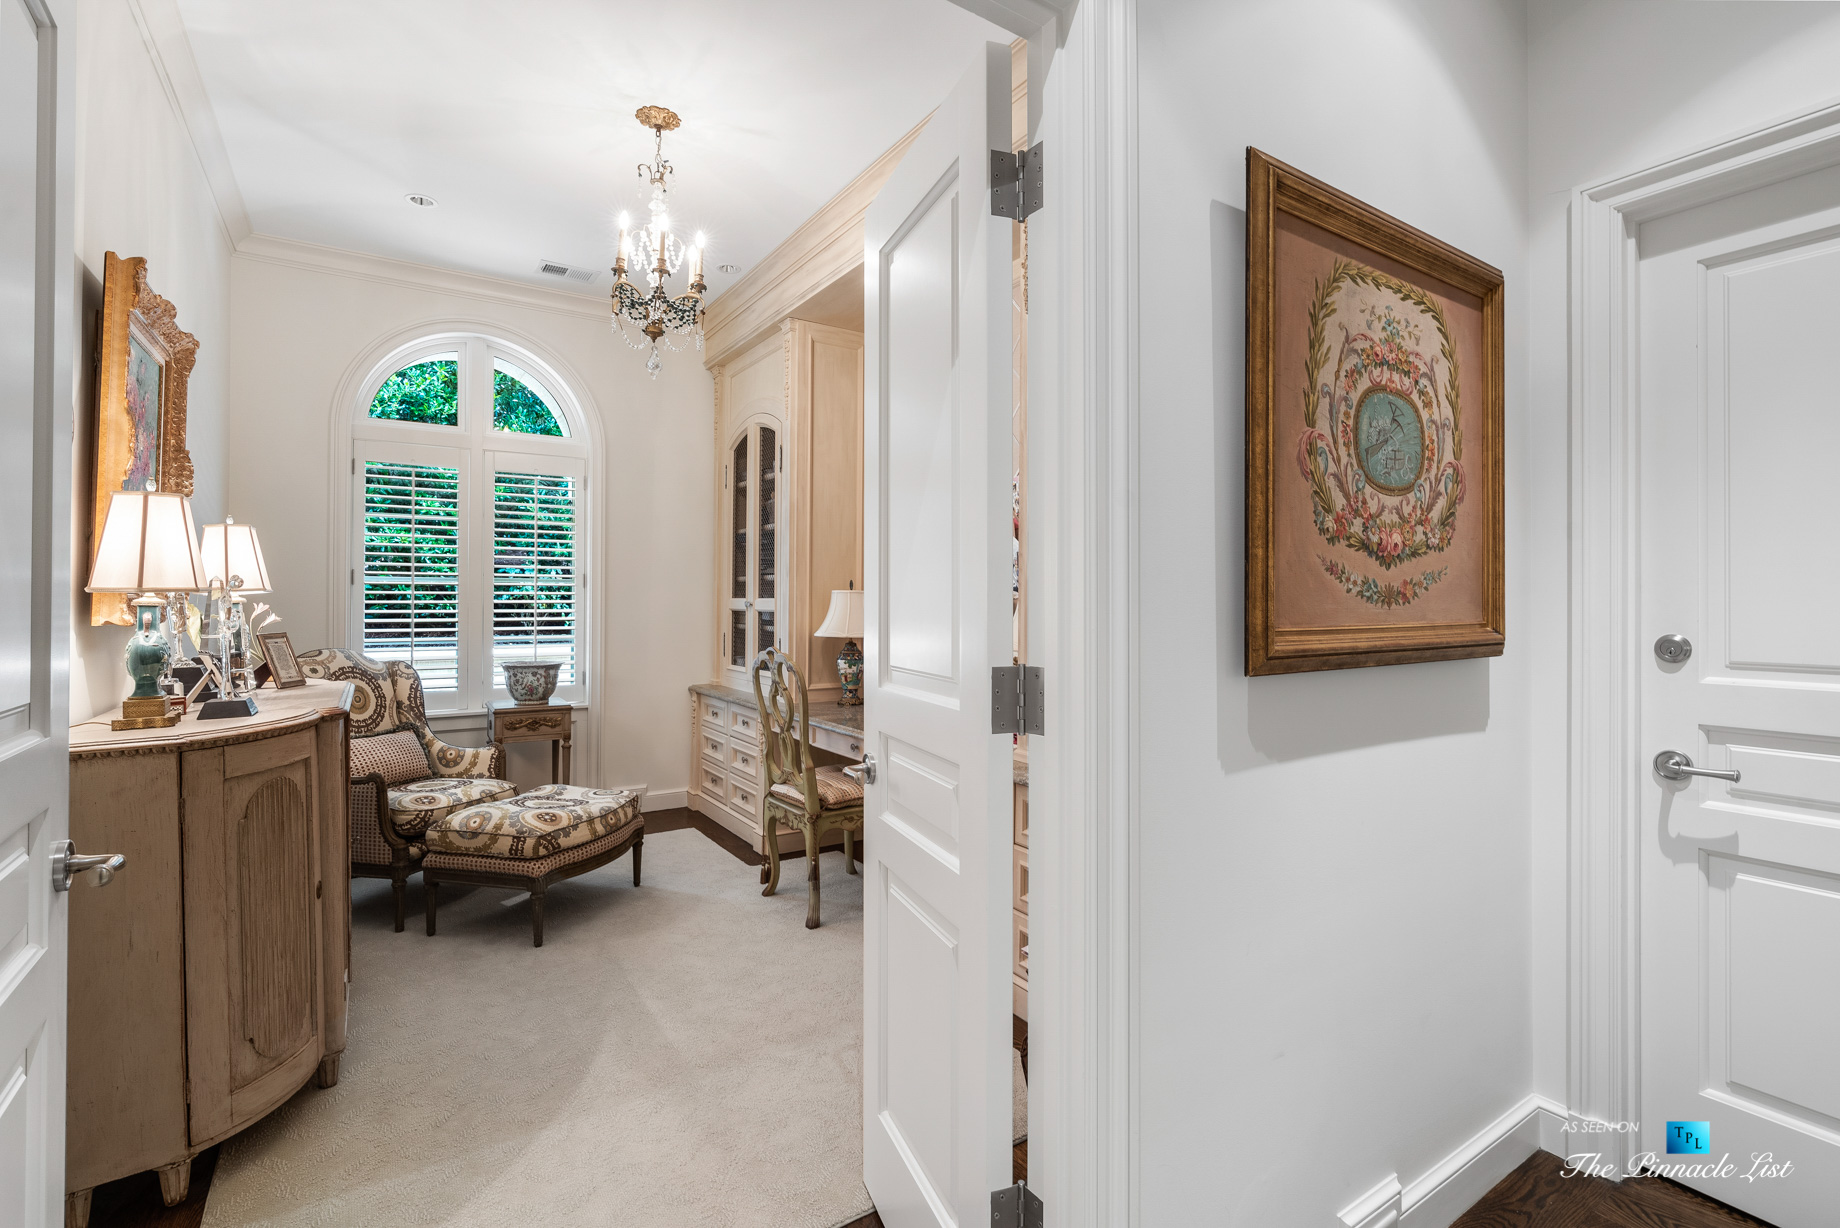 439 Blackland Rd NW, Atlanta, GA, USA - Private Sitting Area - Luxury Real Estate - Tuxedo Park Mediterranean Mansion Home